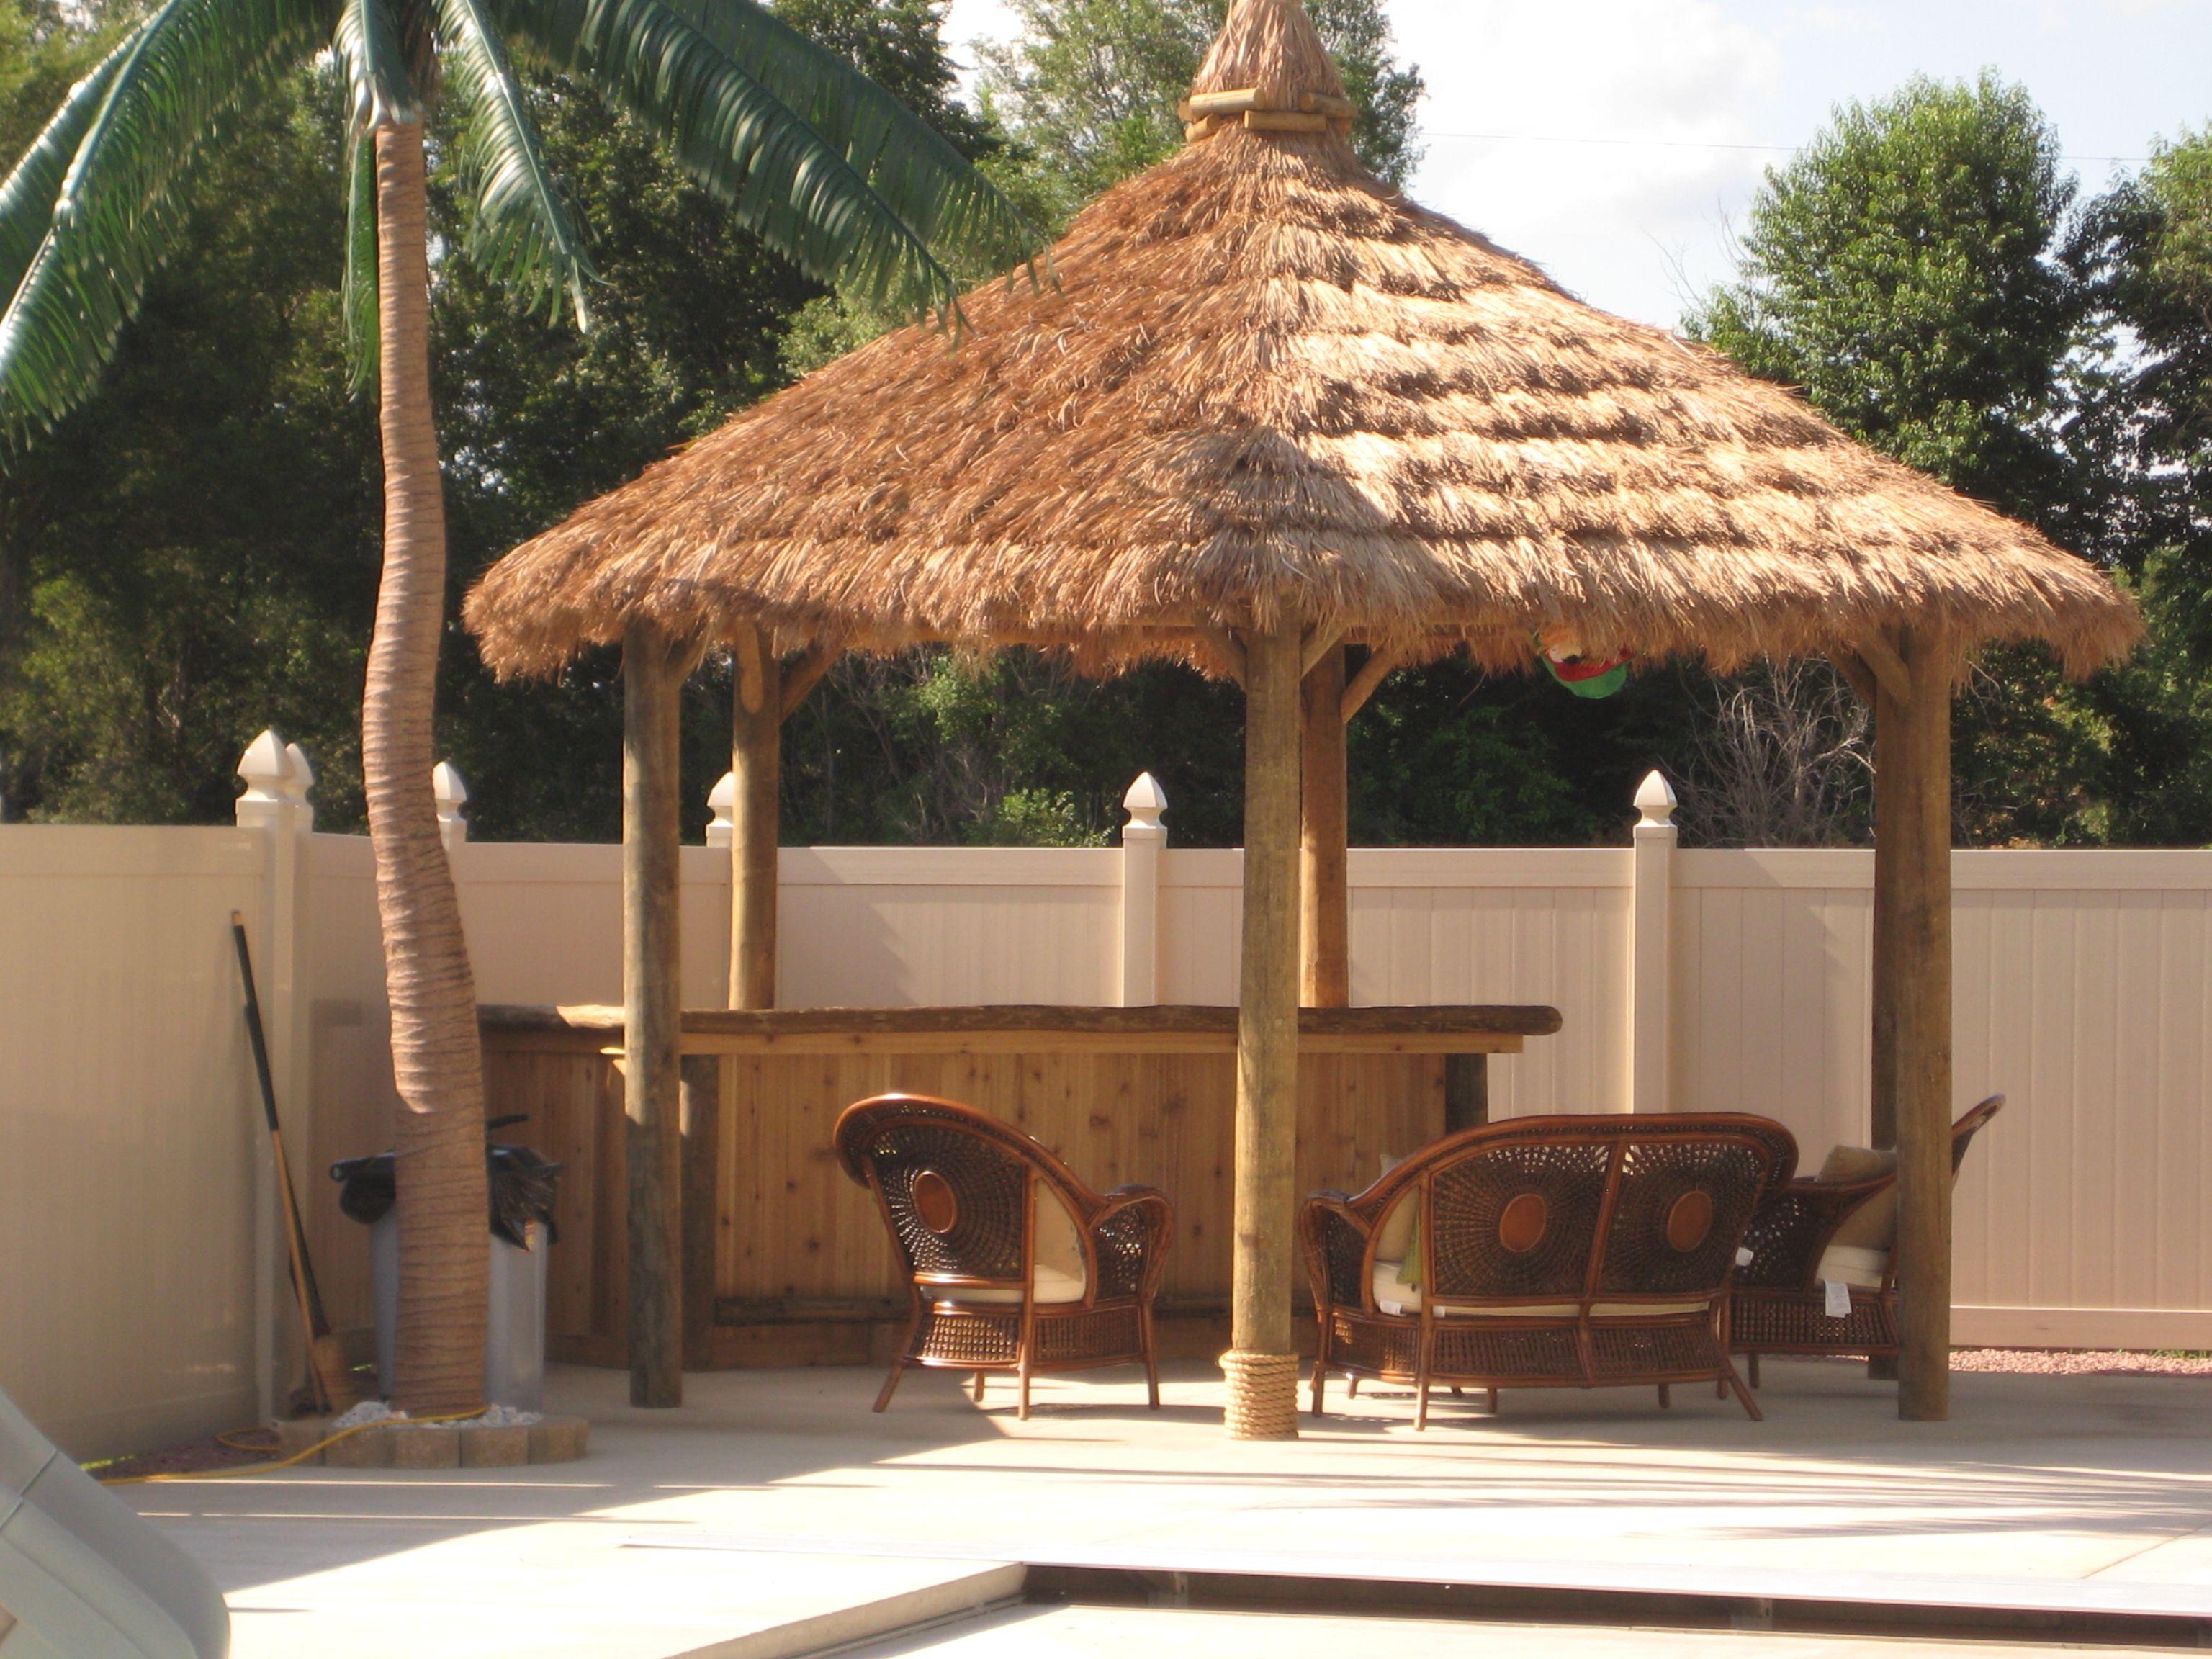 Tiki Hut Kits Back Yard | DIY Build your own Tiki Hut and ...